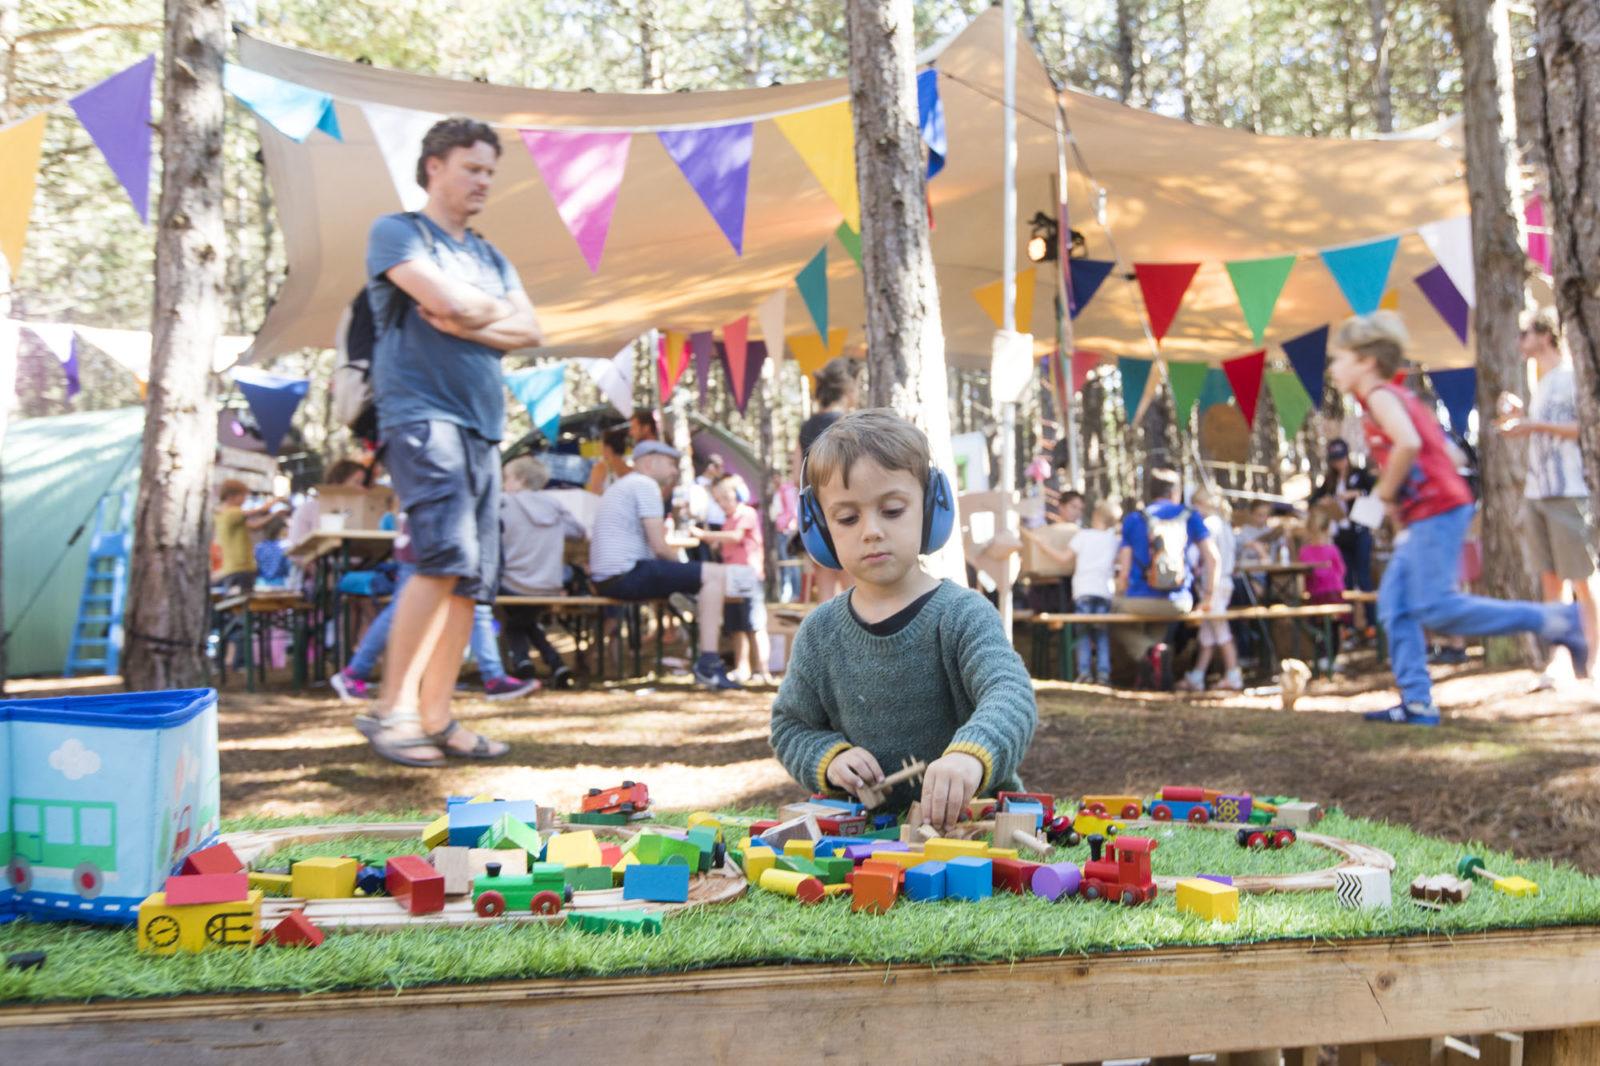 Triomf - speelgoedtrein festival triomf